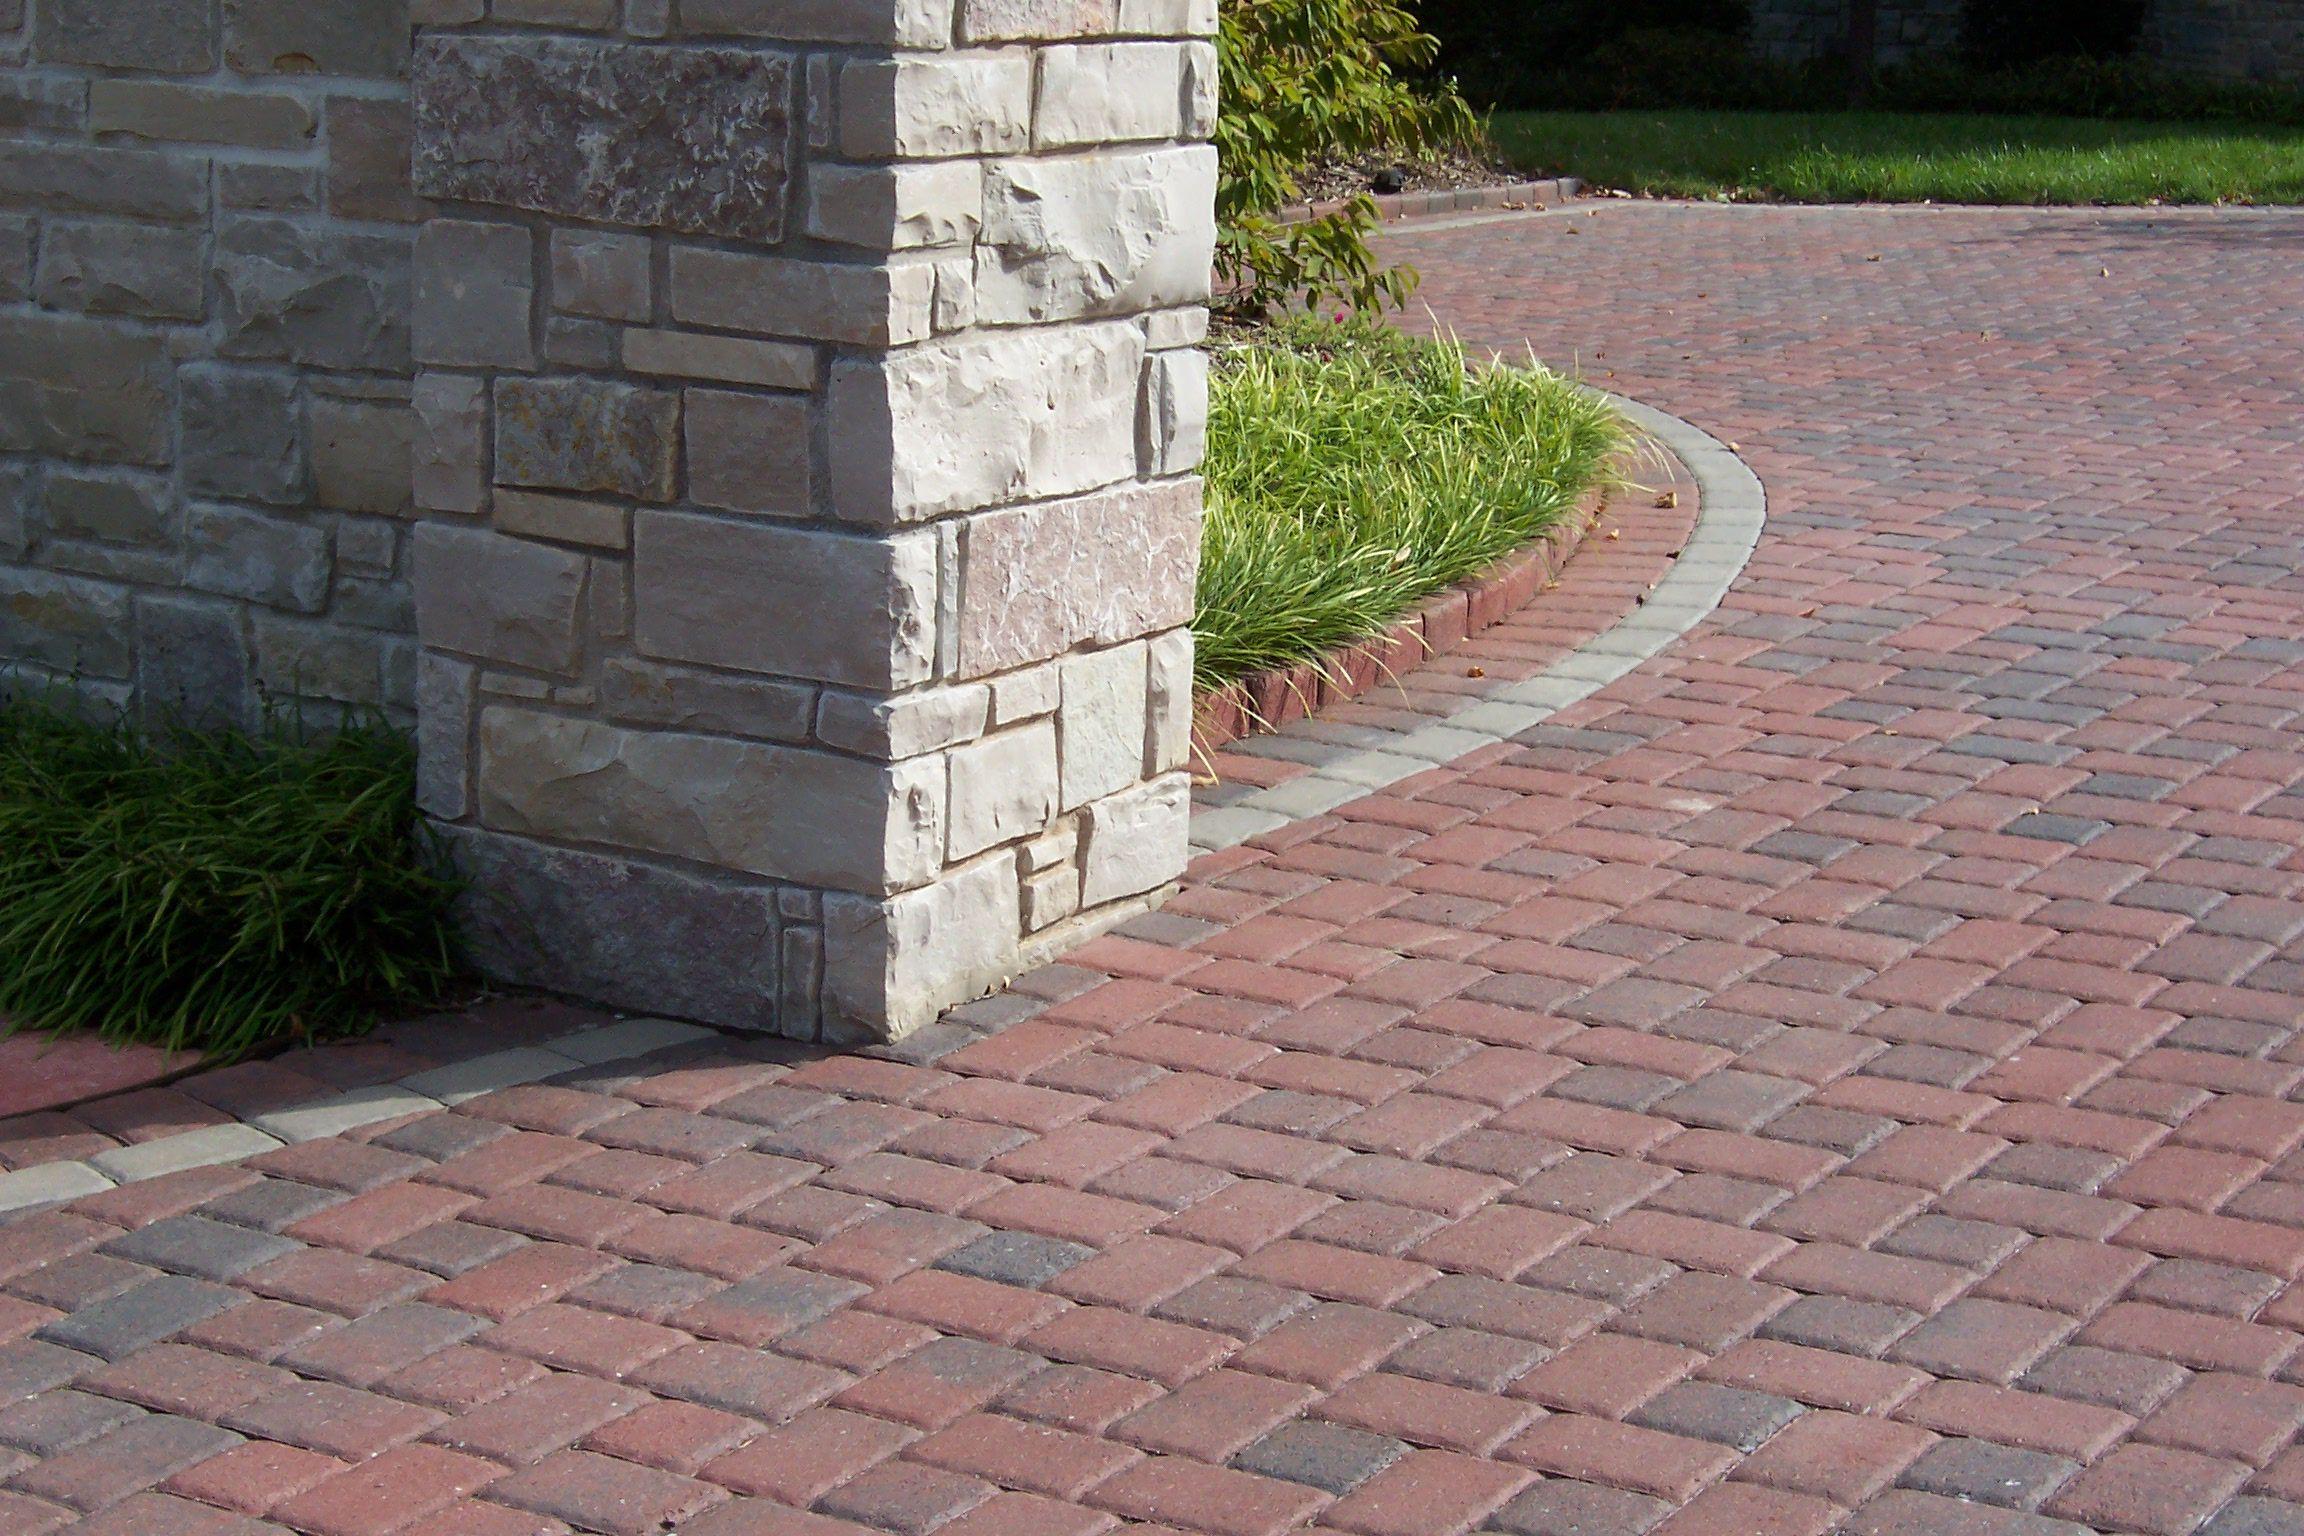 Interlocking Brick Pavers Romanstone Interlocking Concrete Pavers.cobble 6X6 And 6X9